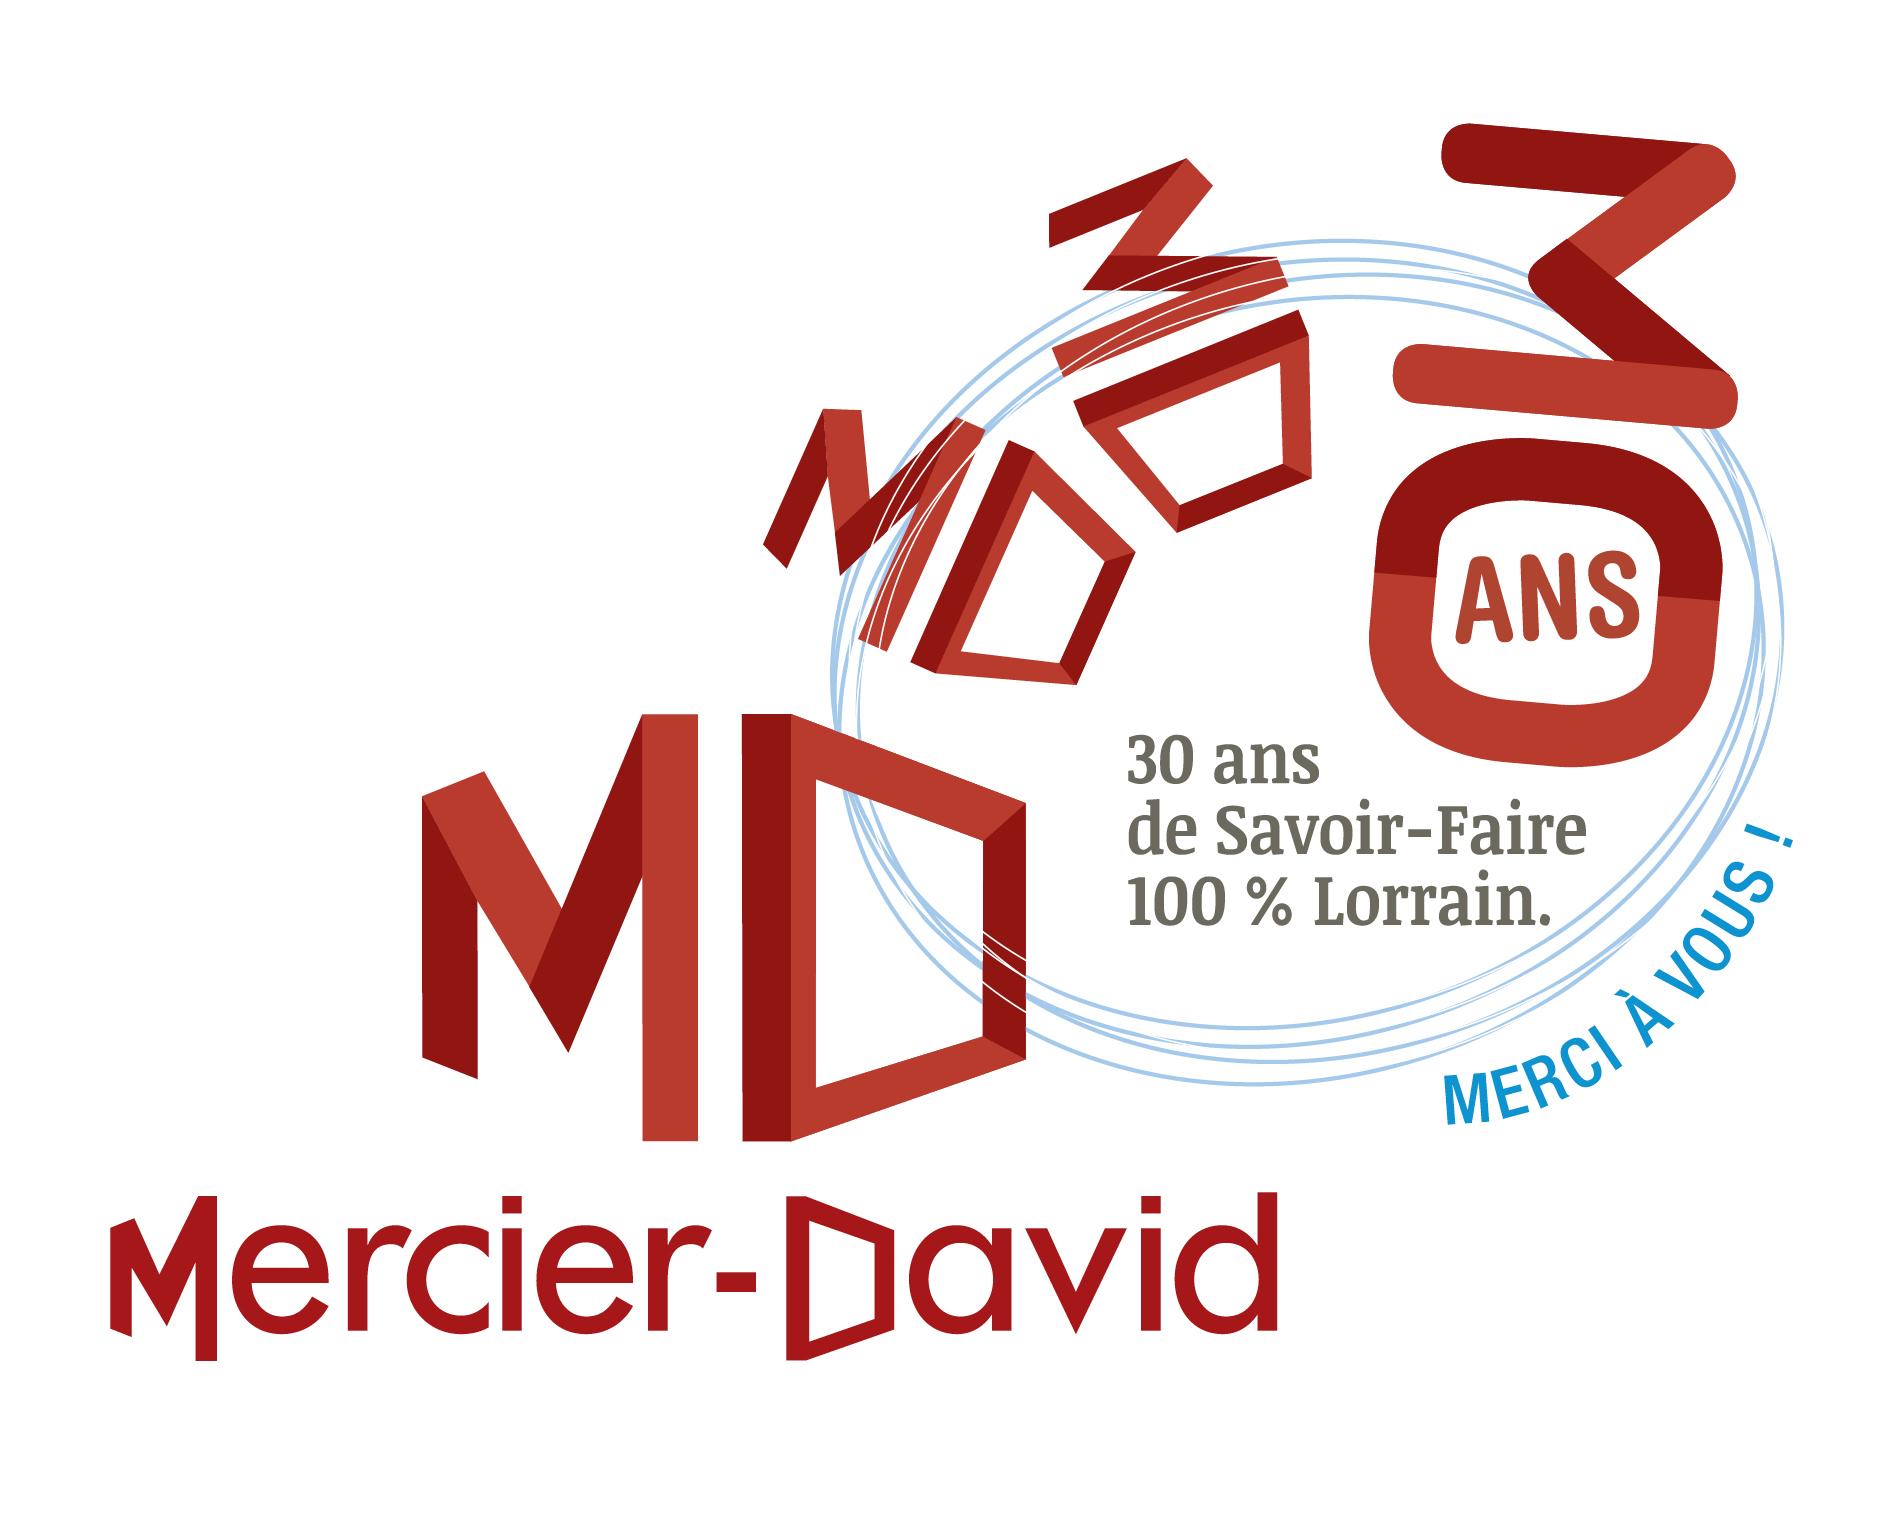 MD_2017_Signature 30 ANS_2.jpg